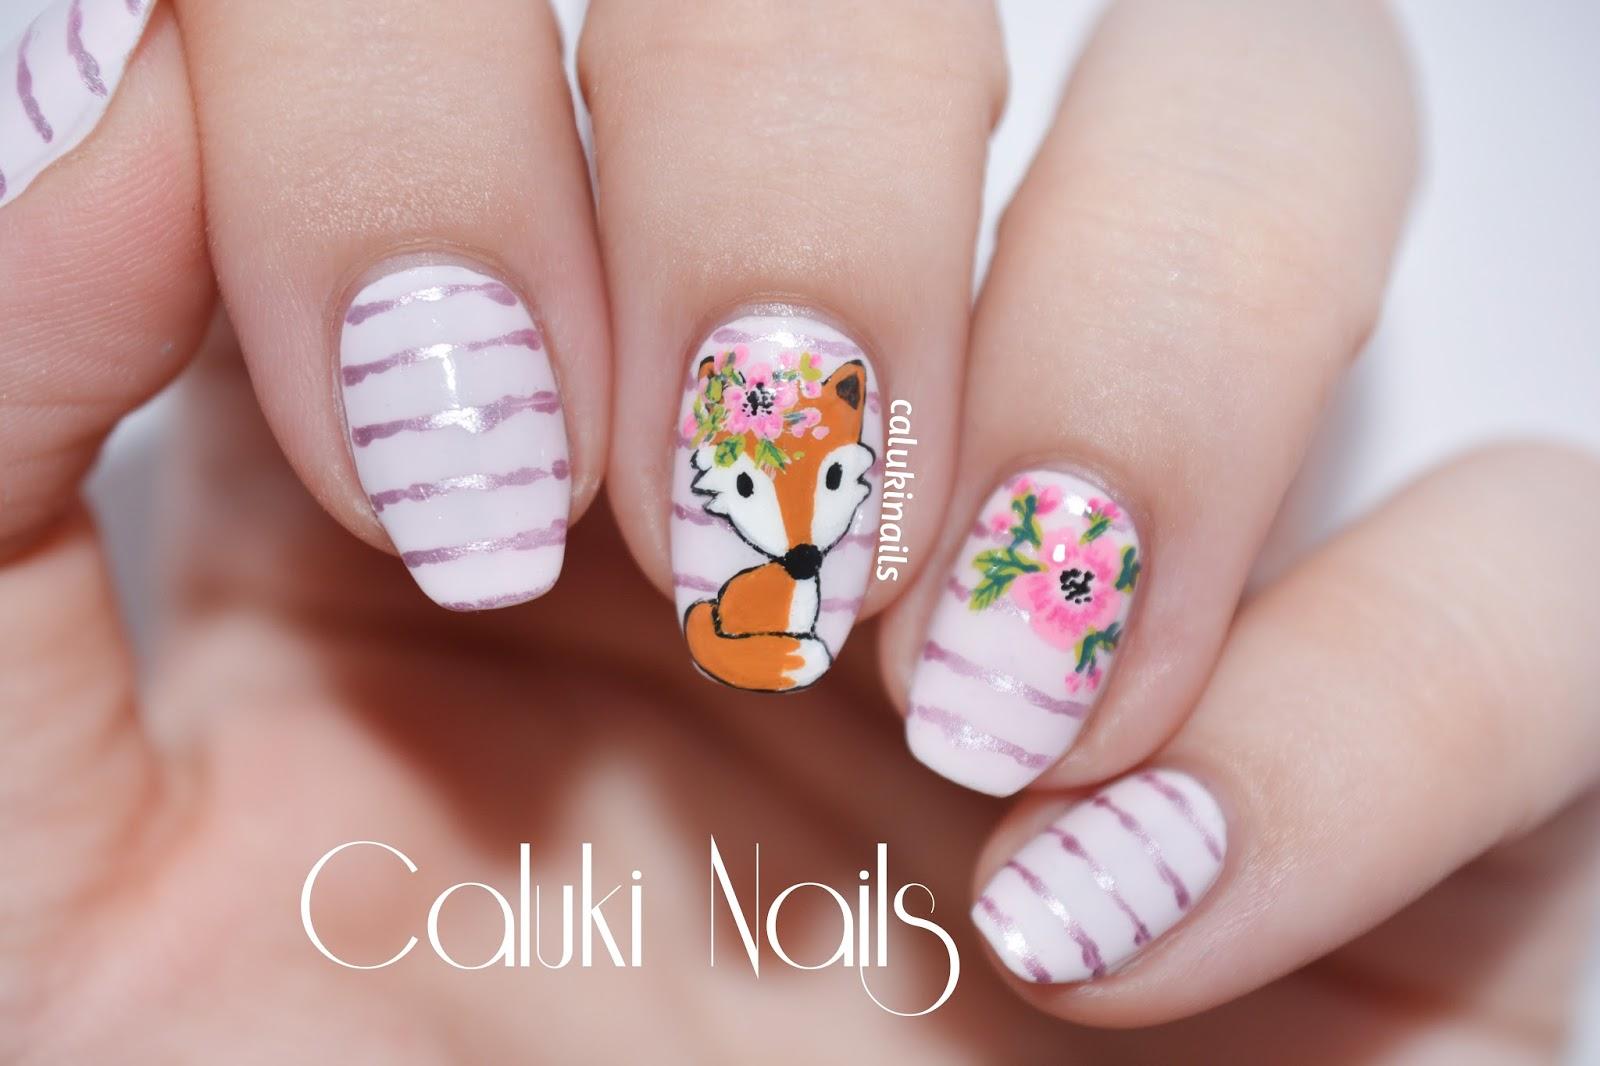 Caluki Nails Nail Art Zorrito Bienvenida Primavera Pastel City